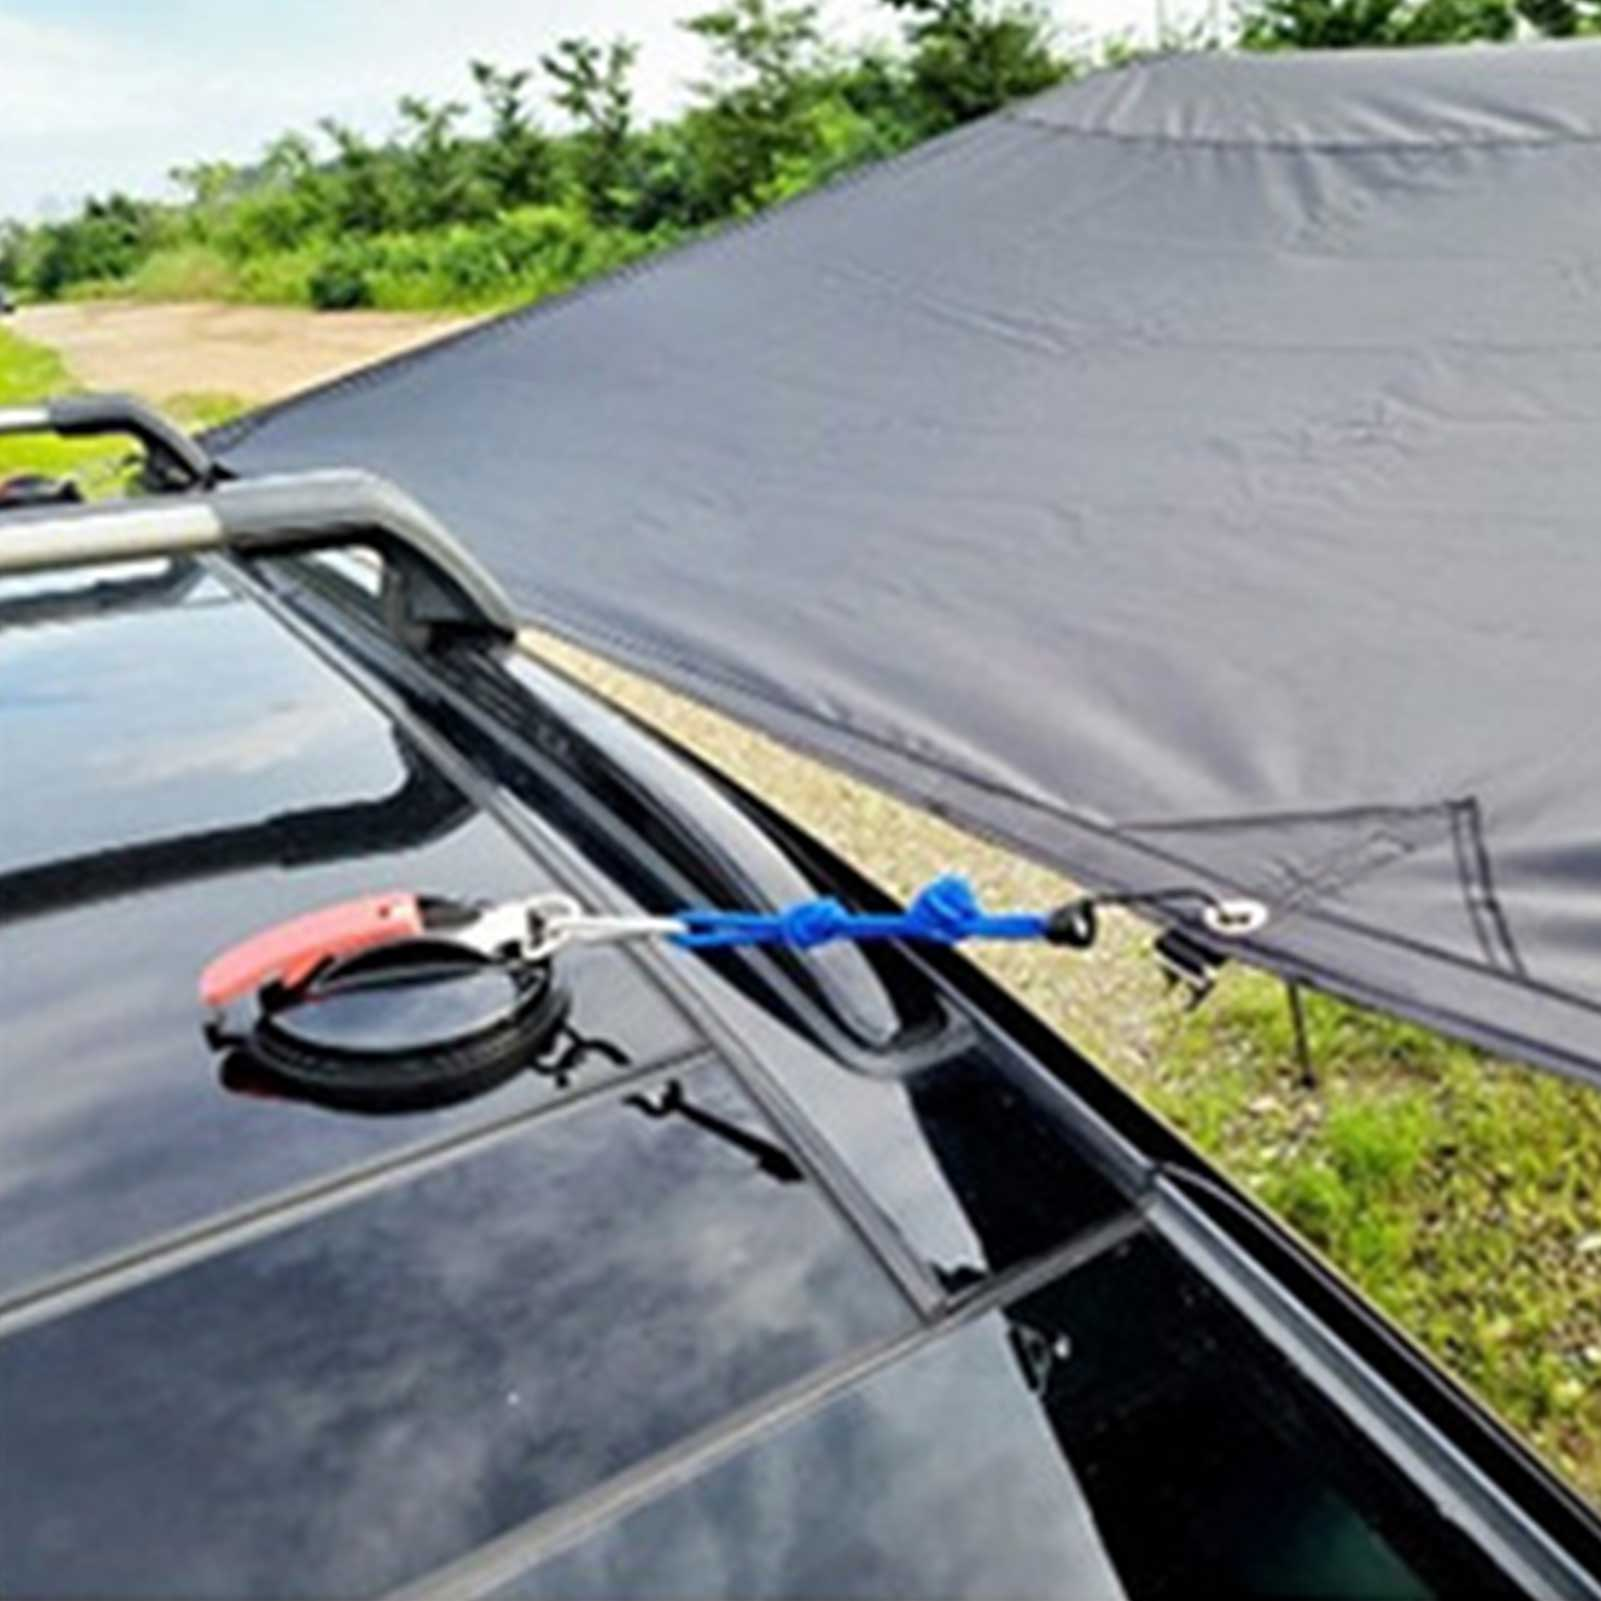 Camping Zelt Saugnapf-Halterung